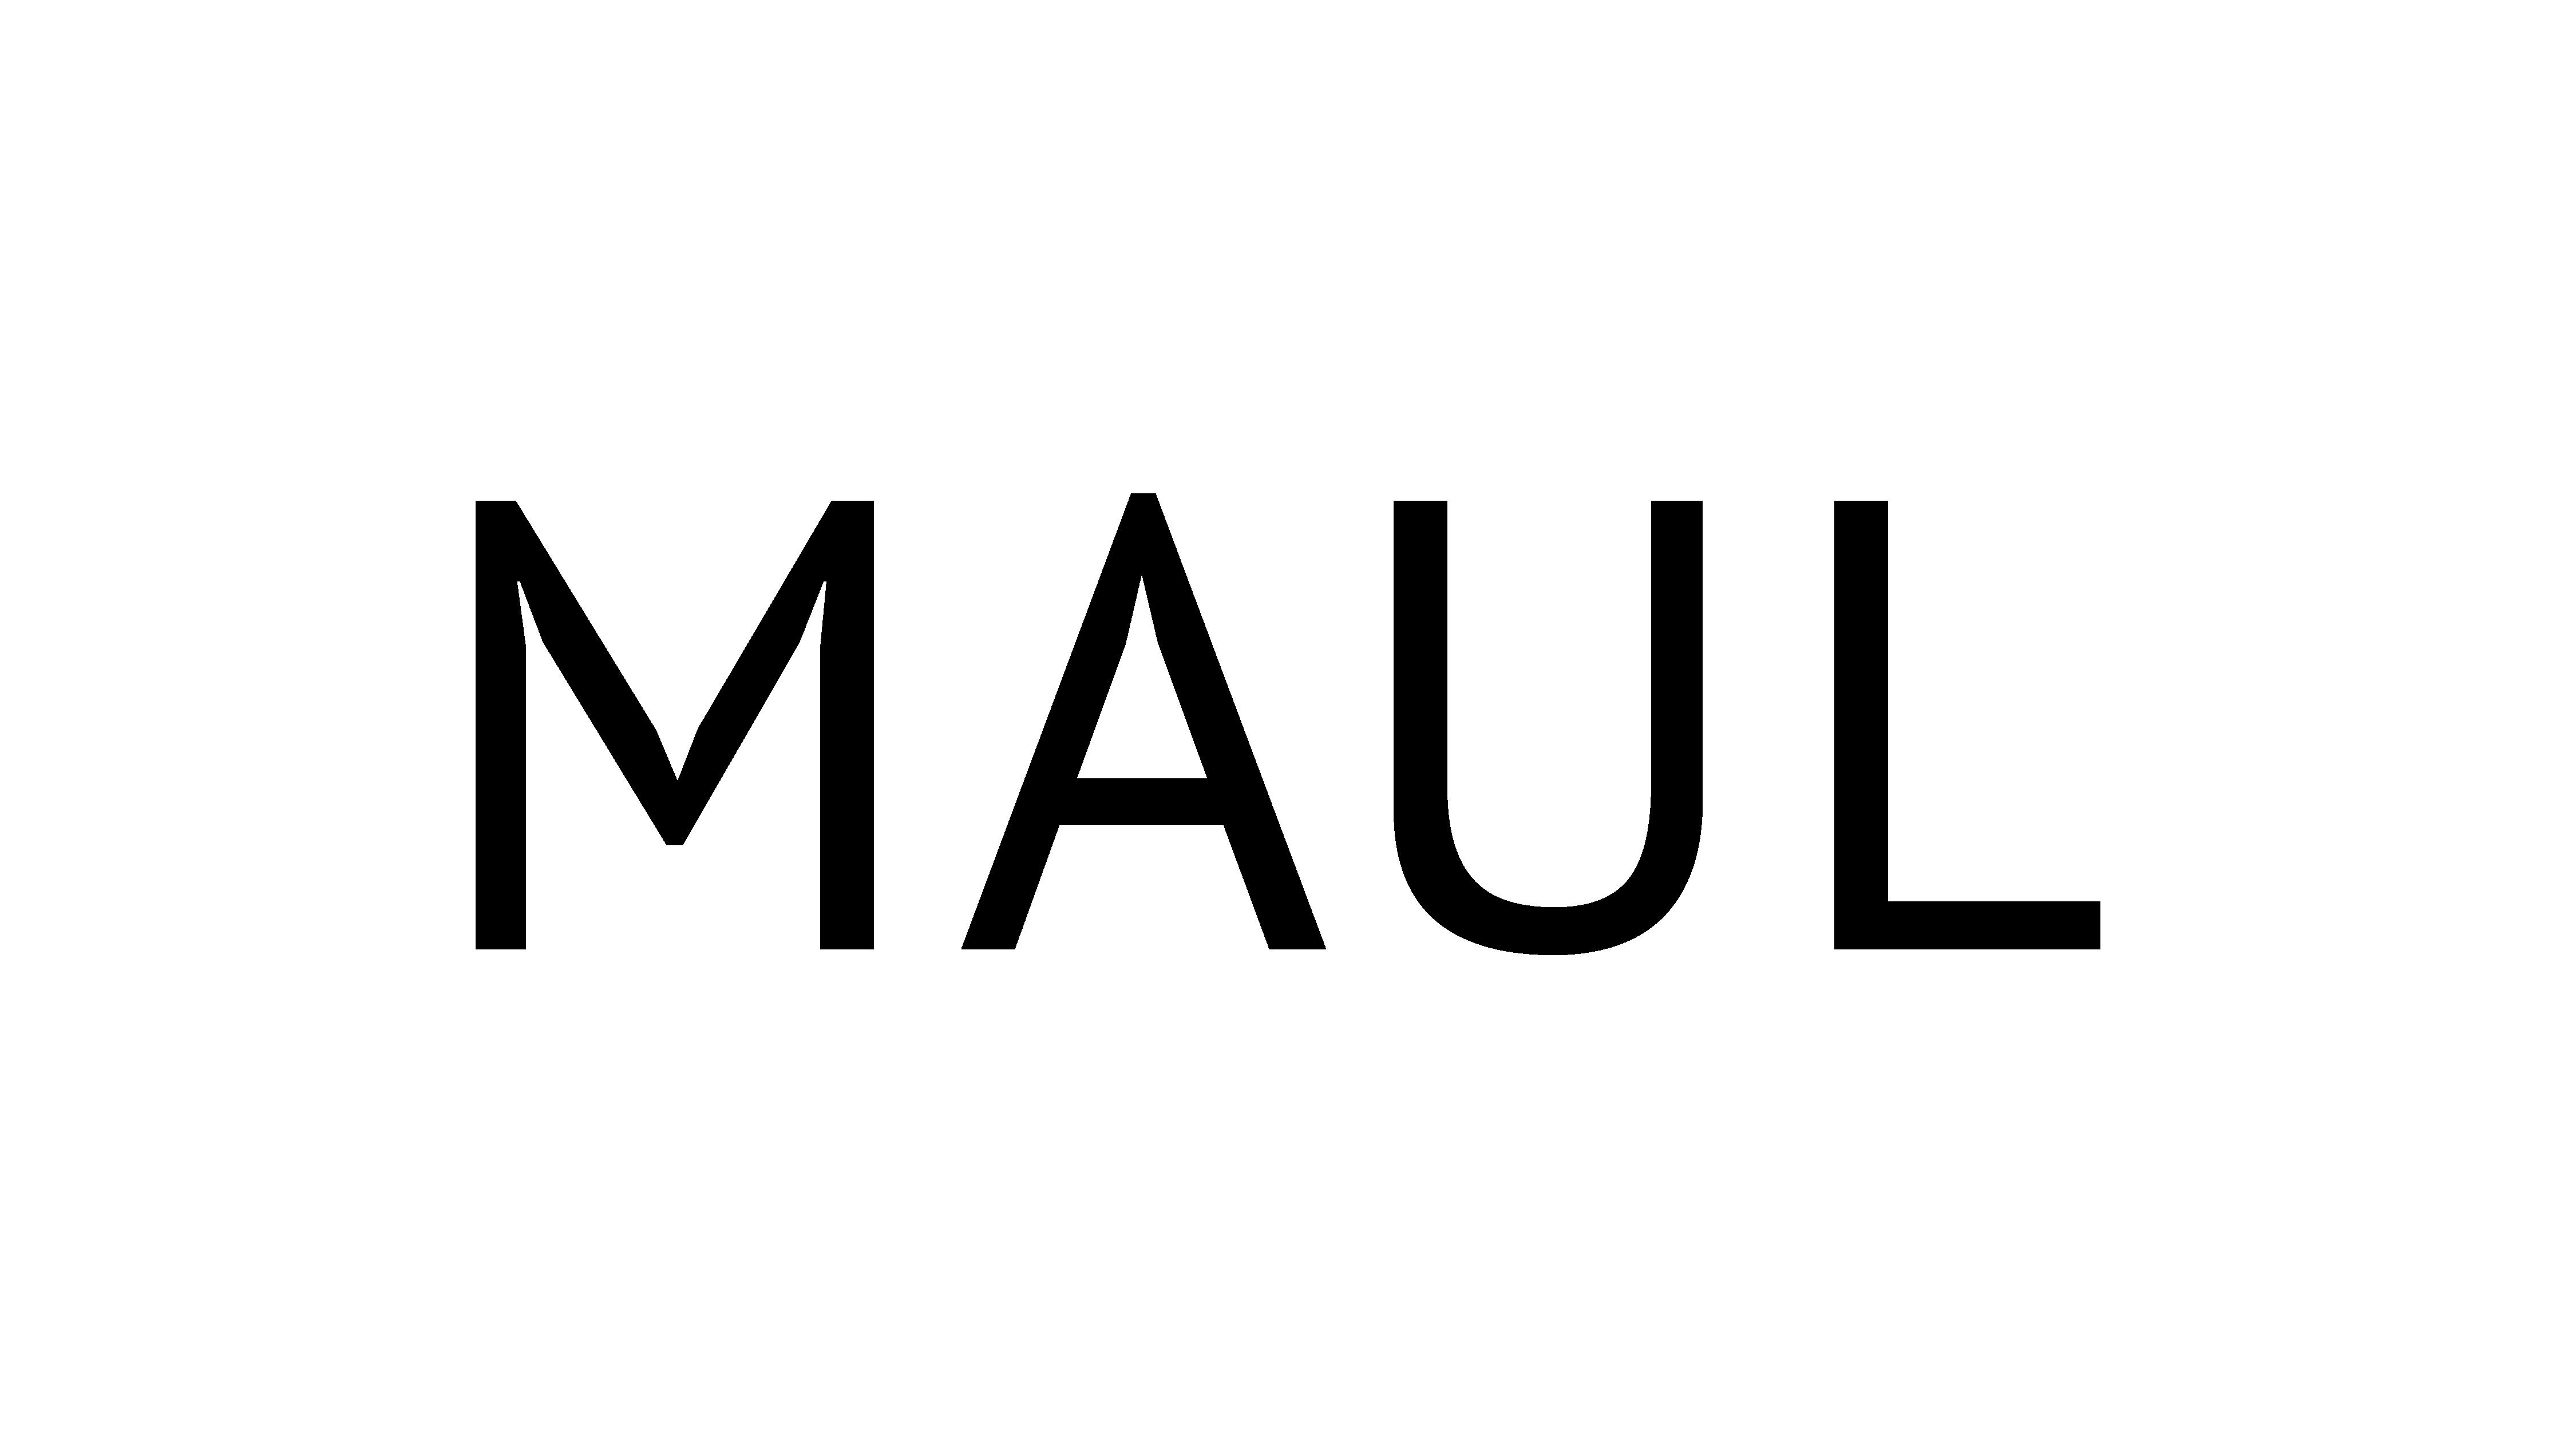 Maul Street